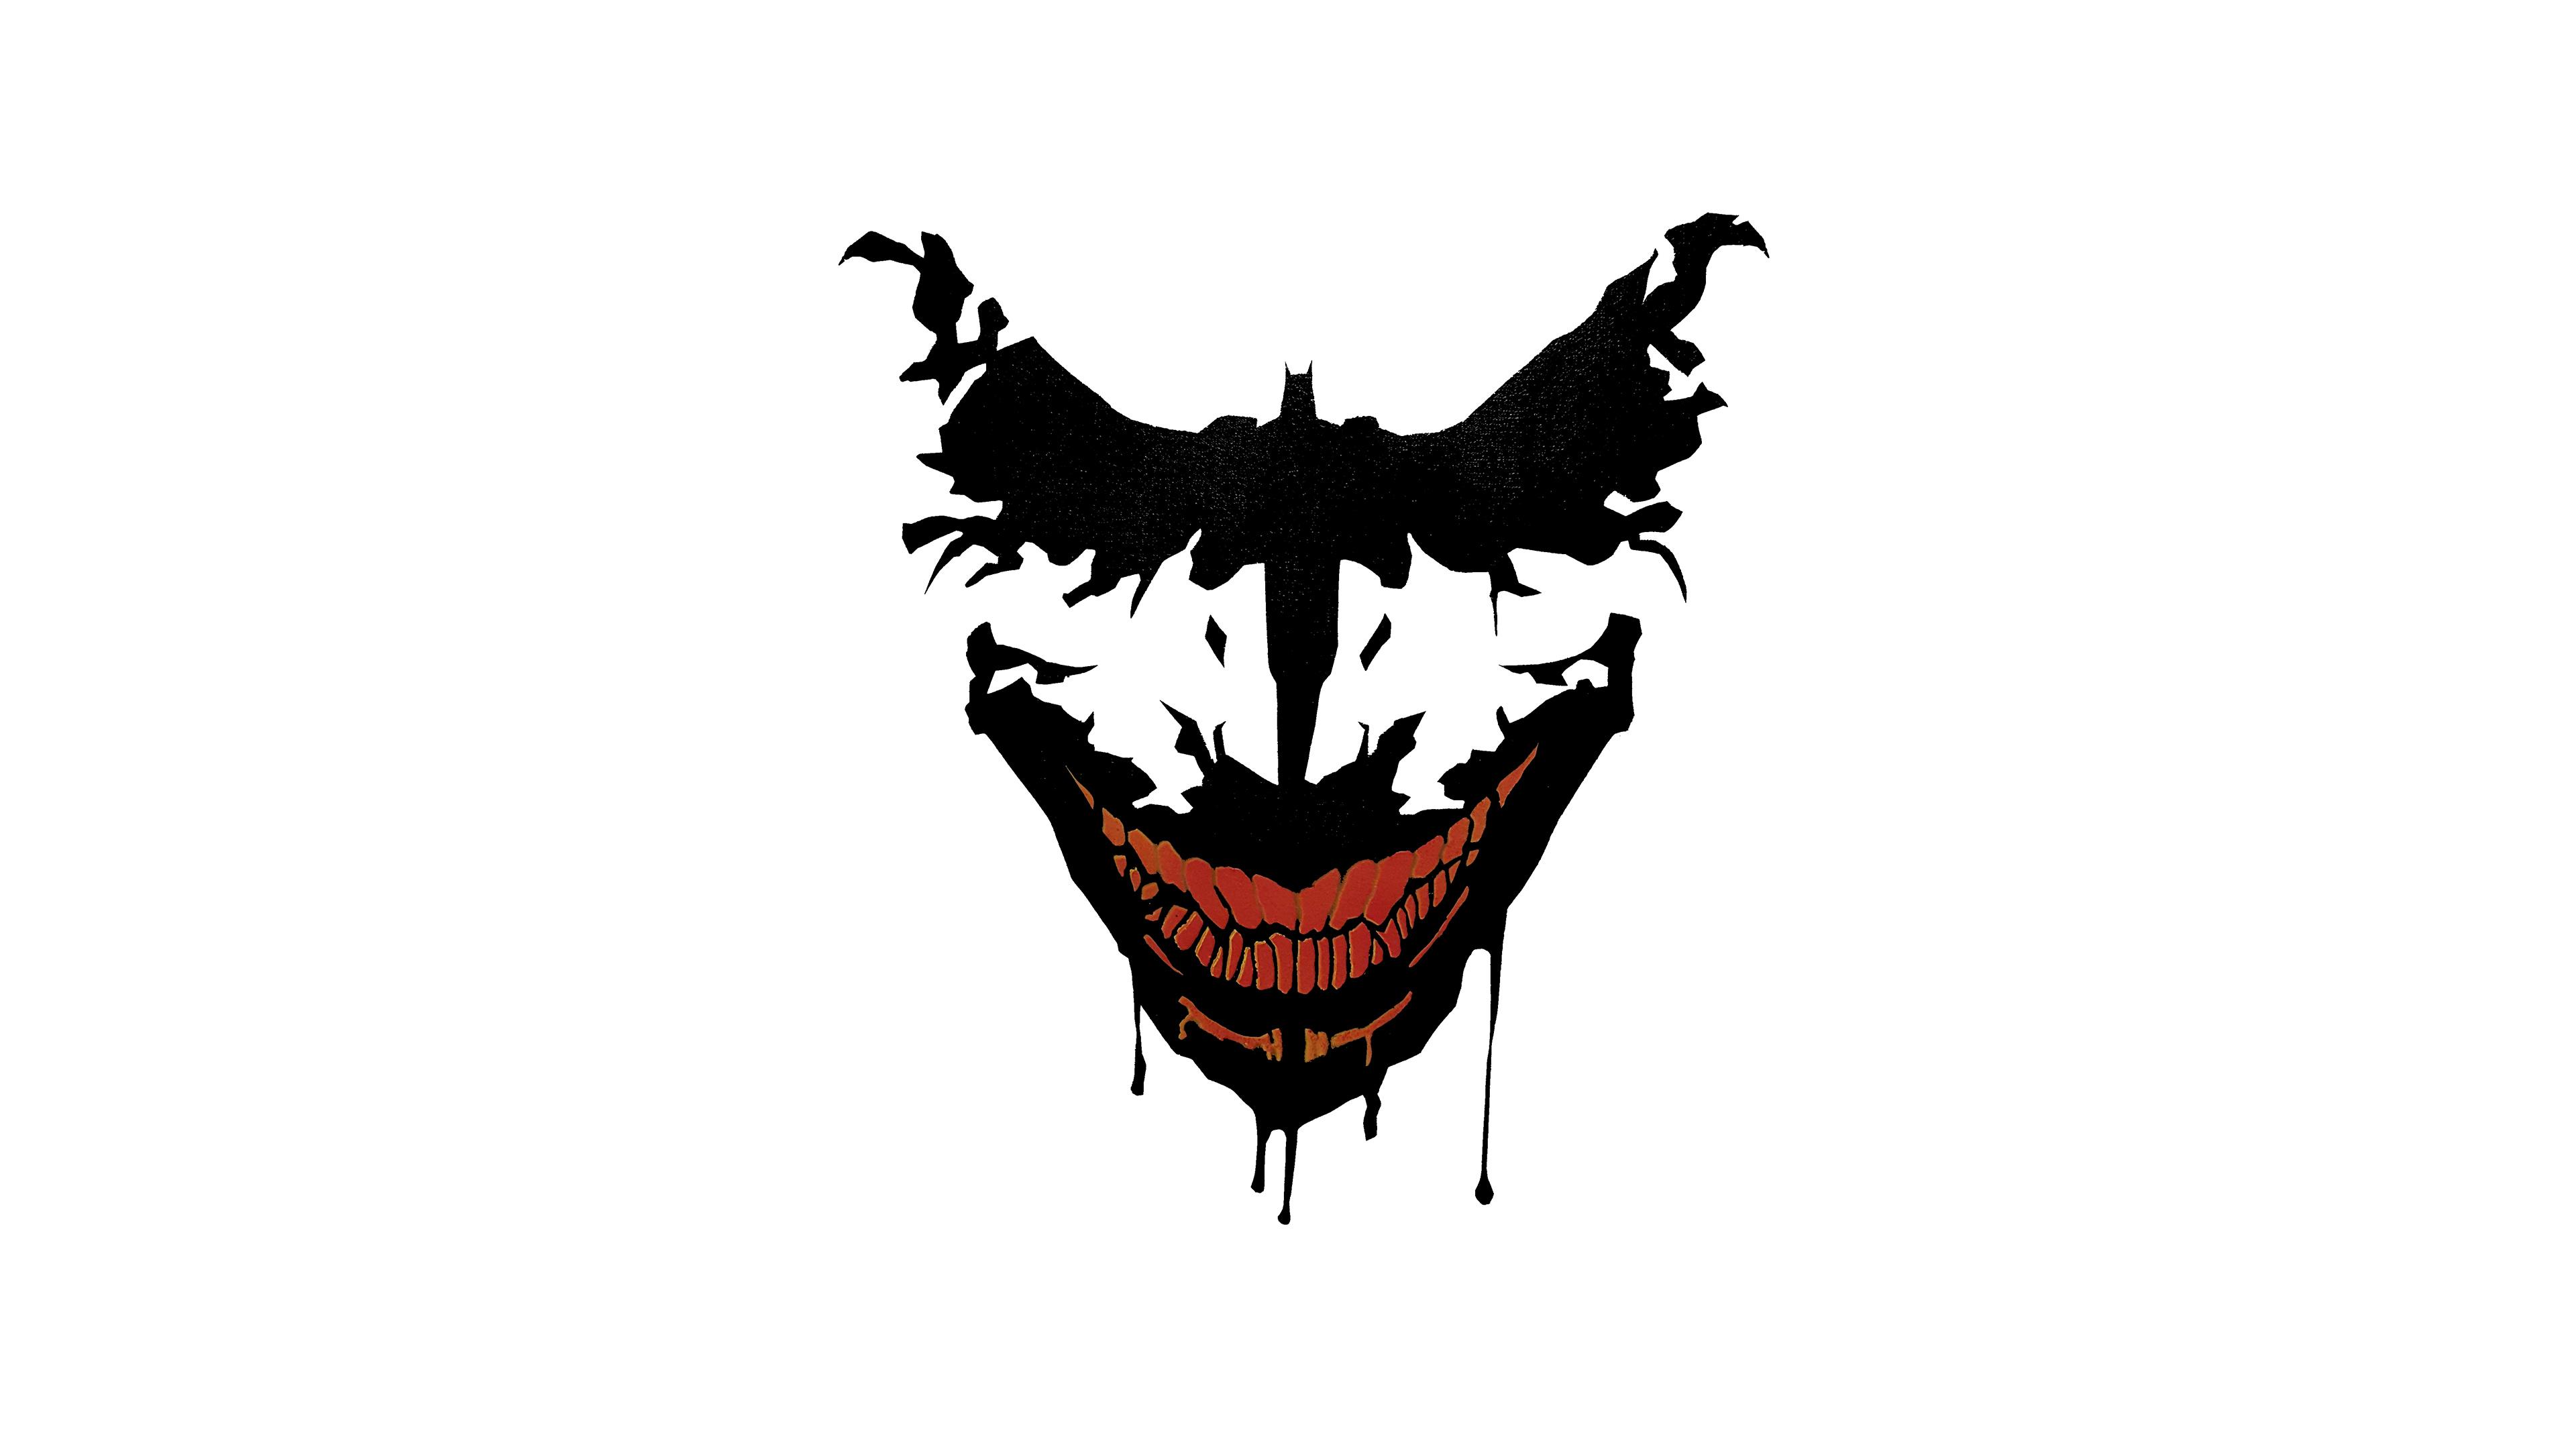 Joker Bat Art Hd Superheroes 4k Wallpapers Images